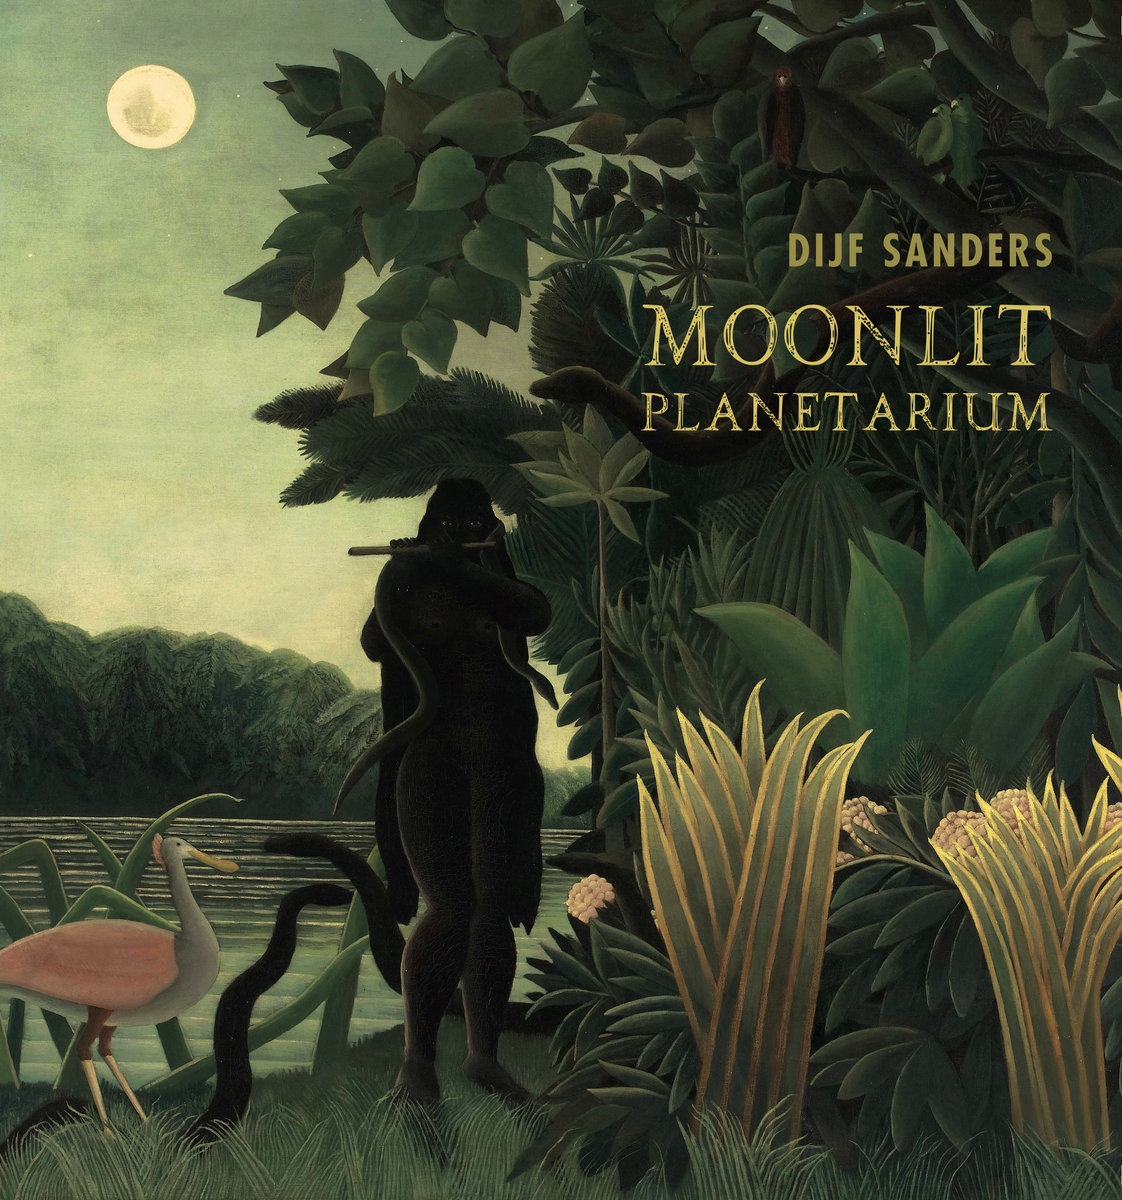 Dijf Sanders - Moonlit Planetarium